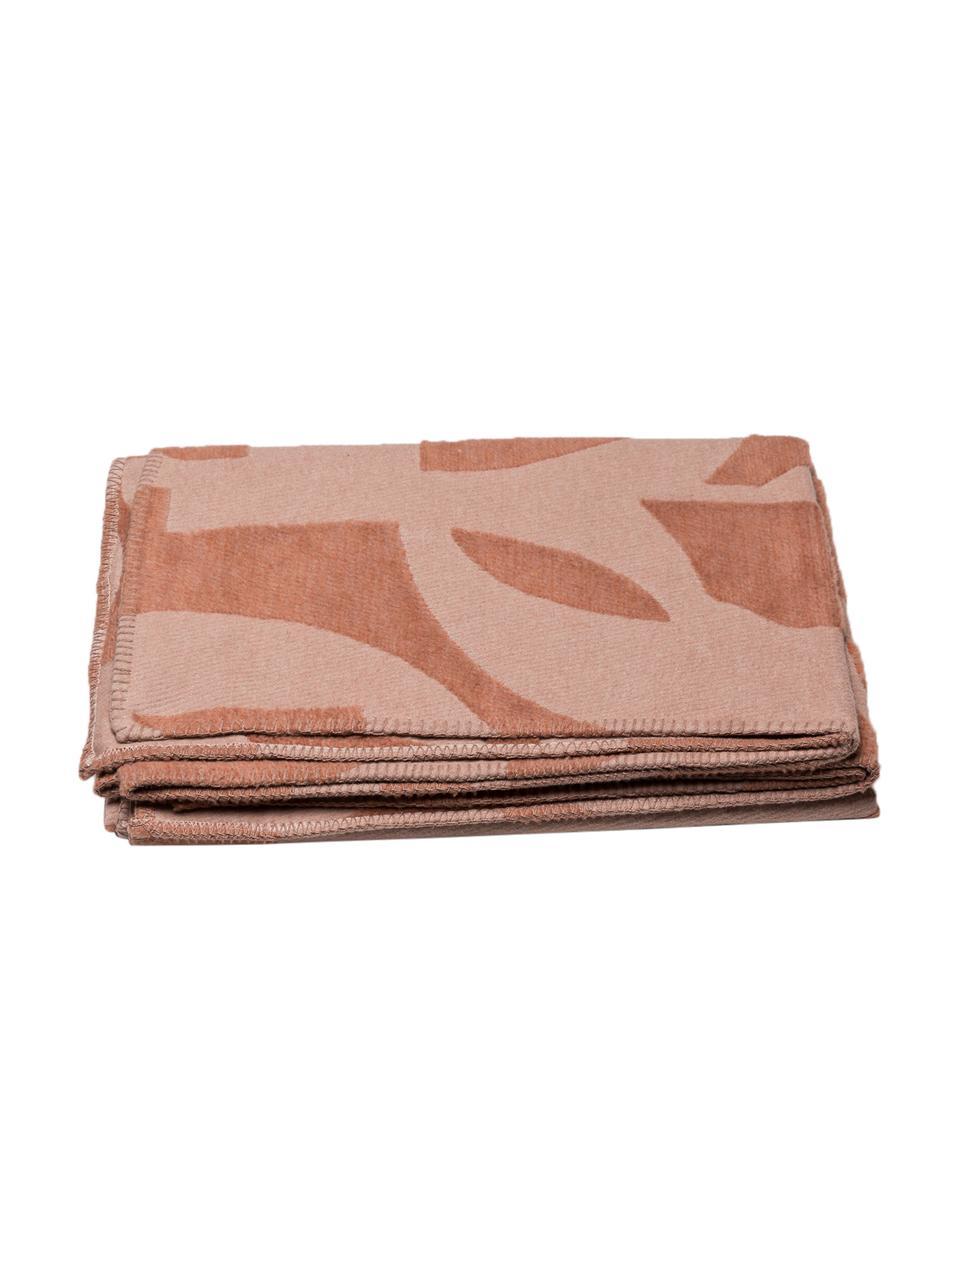 Manta de algodón Grafic, 85%algodón, 15%poliacrílico, Rosa, terracota, An 130 x L 200 cm